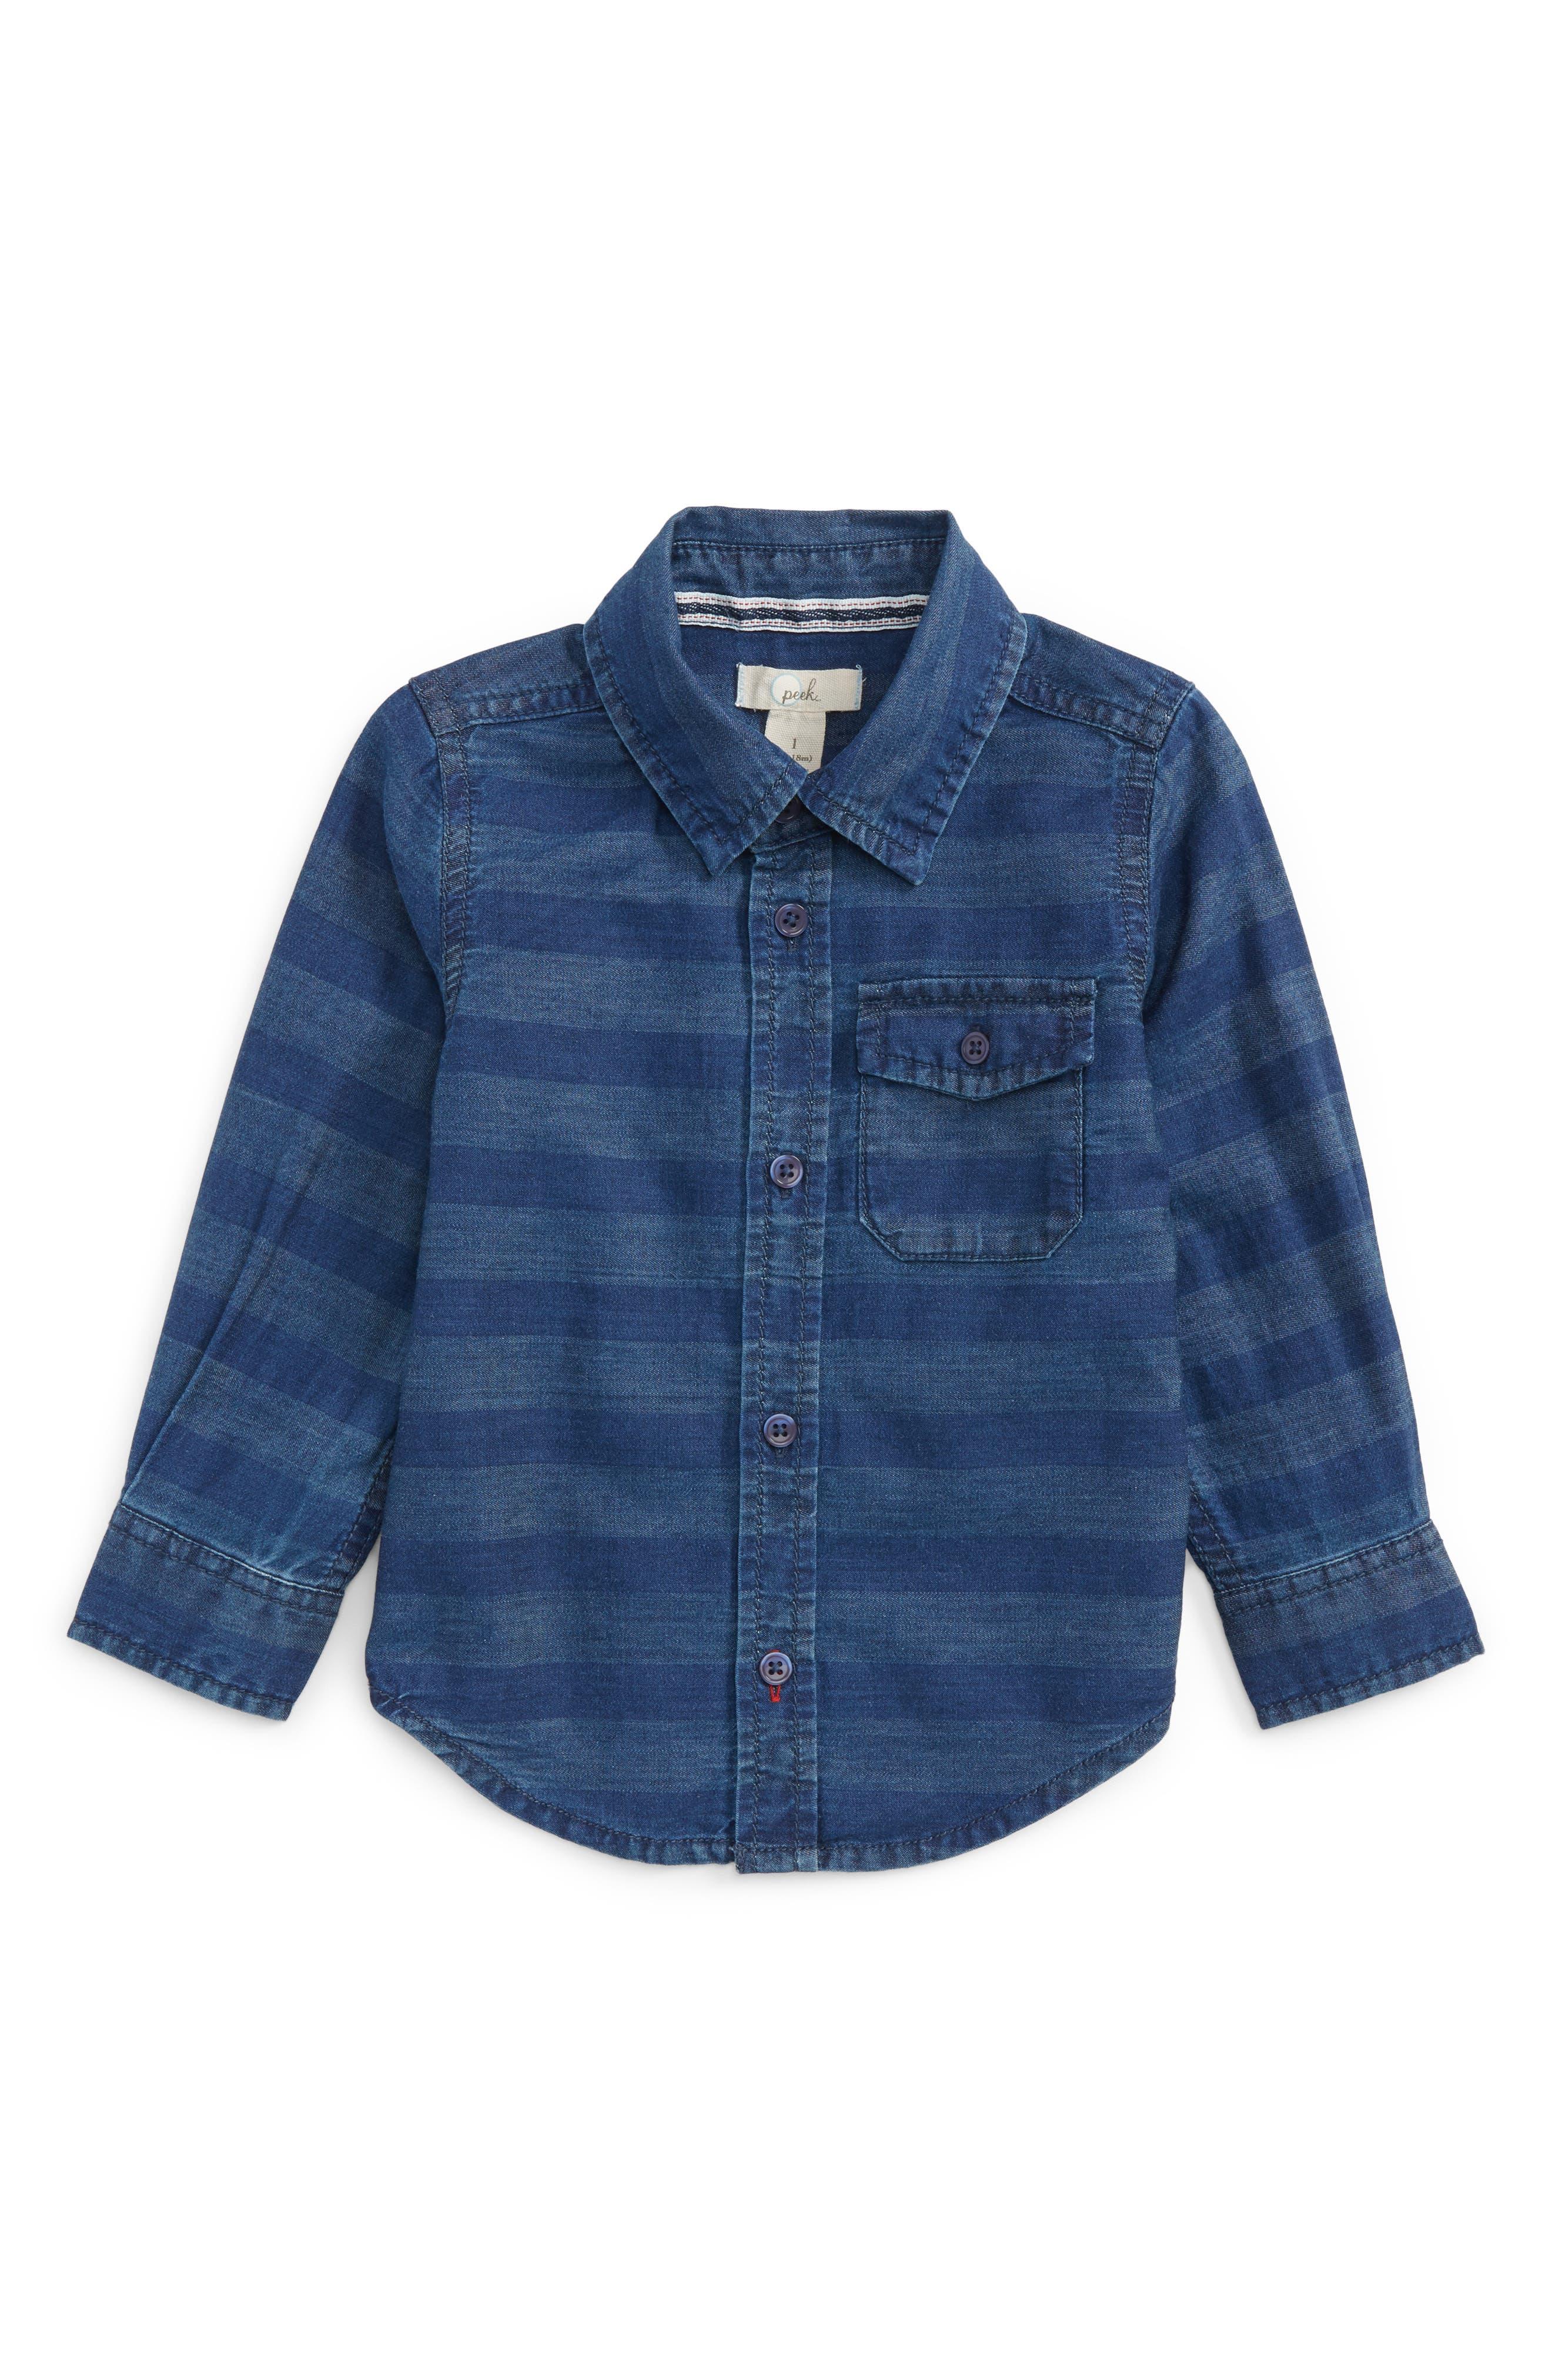 Main Image - Peek Aiden Stripe Chambray Shirt (Baby Boys)